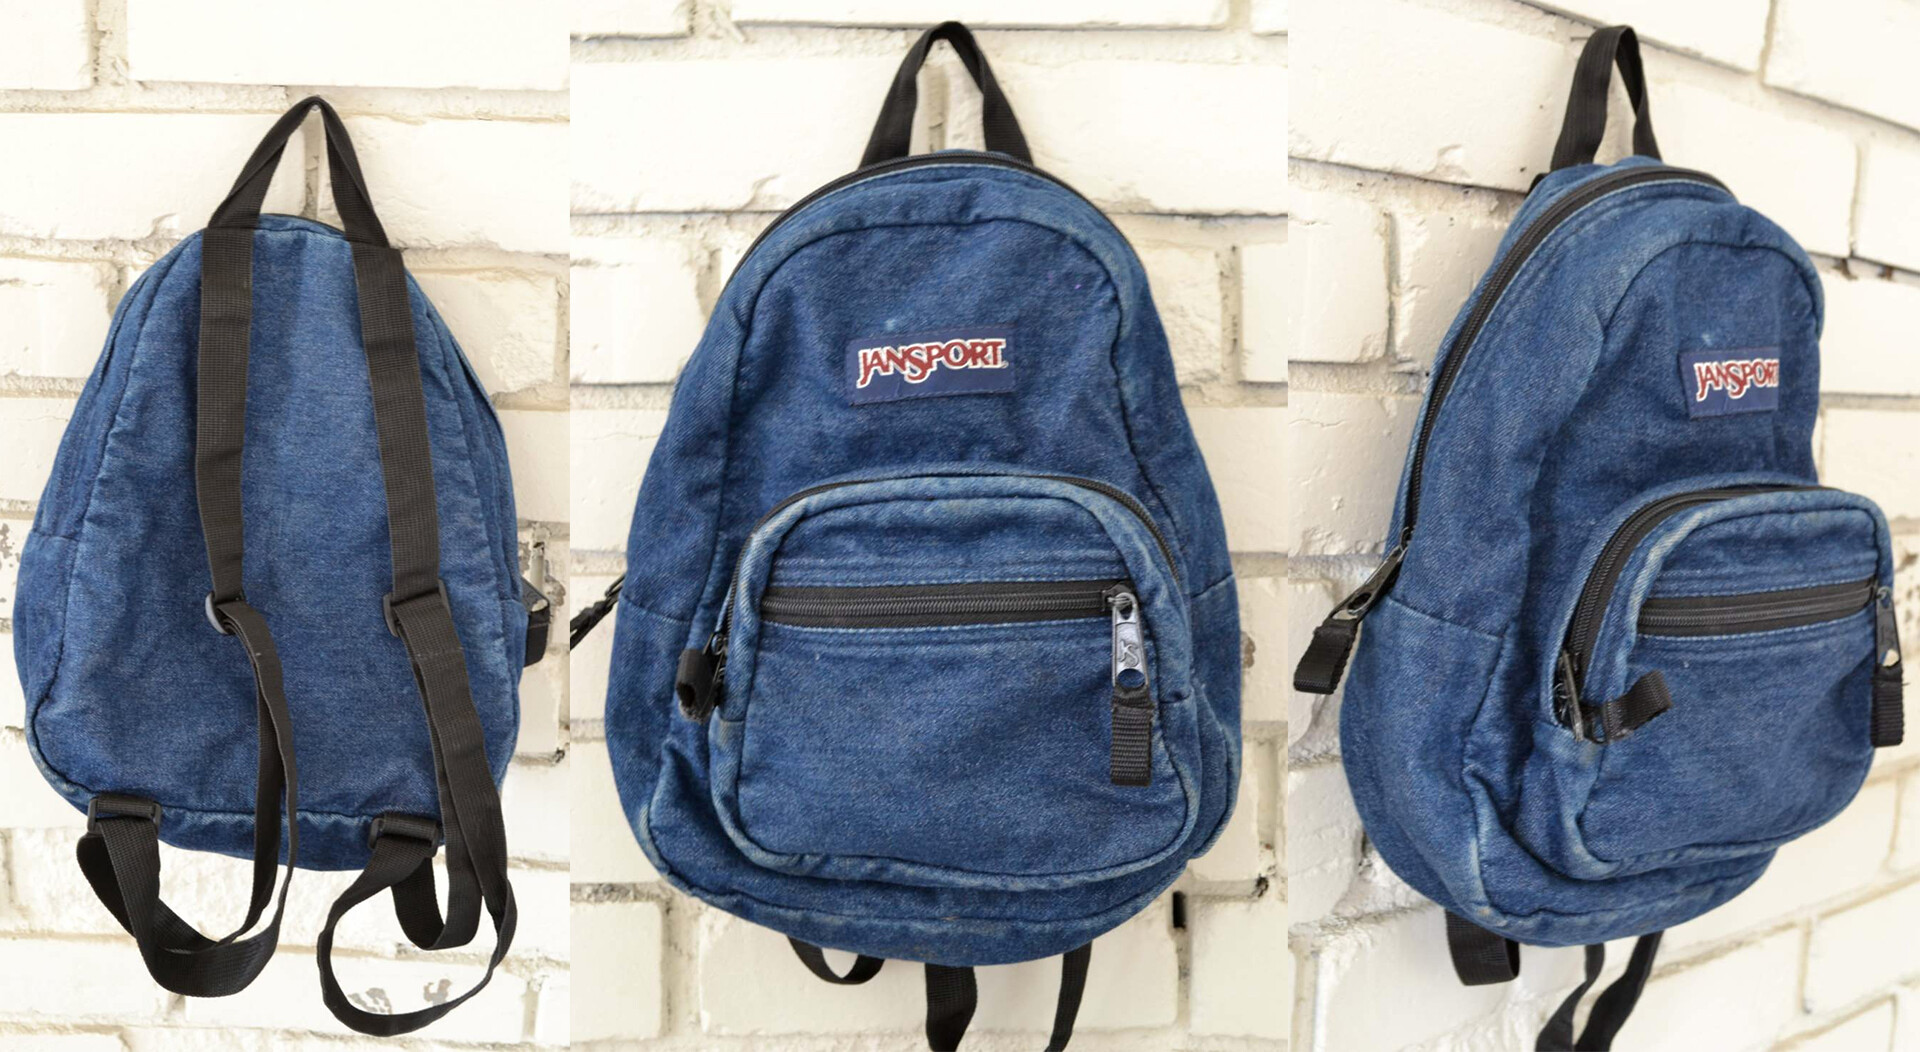 Kurt kupser backpack reference